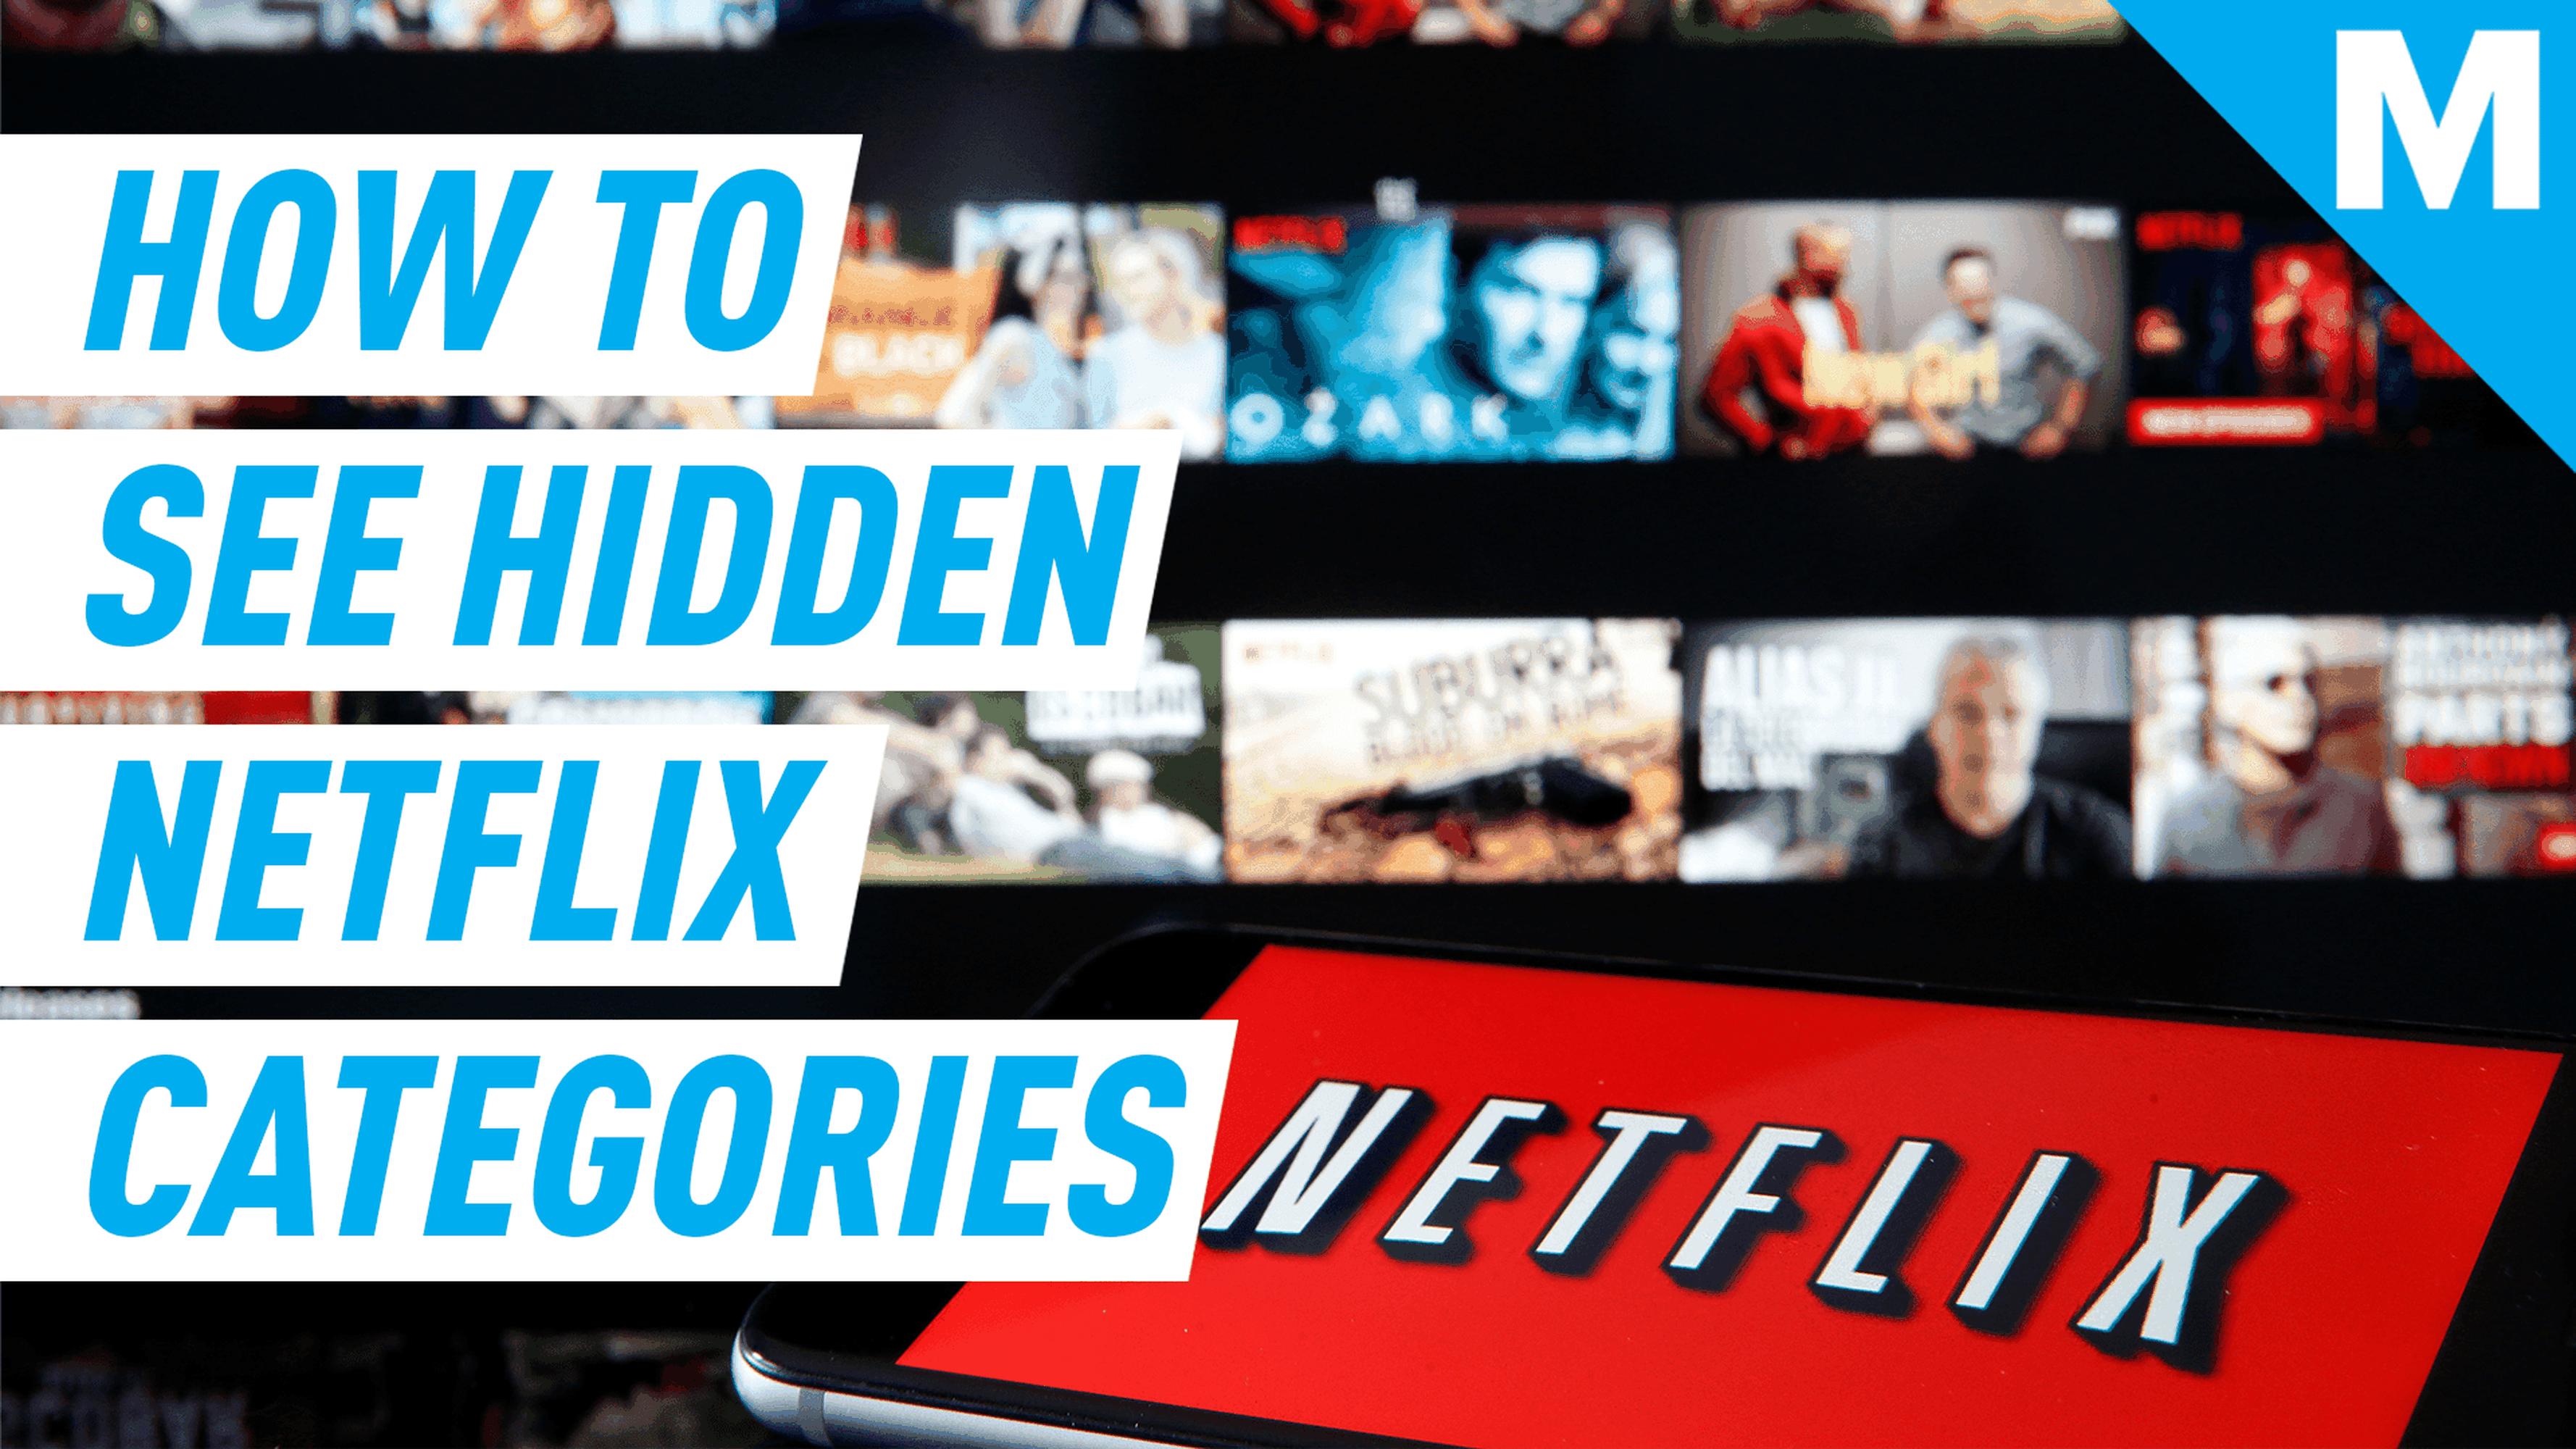 The secret Netflix codes to find tons of hidden categories